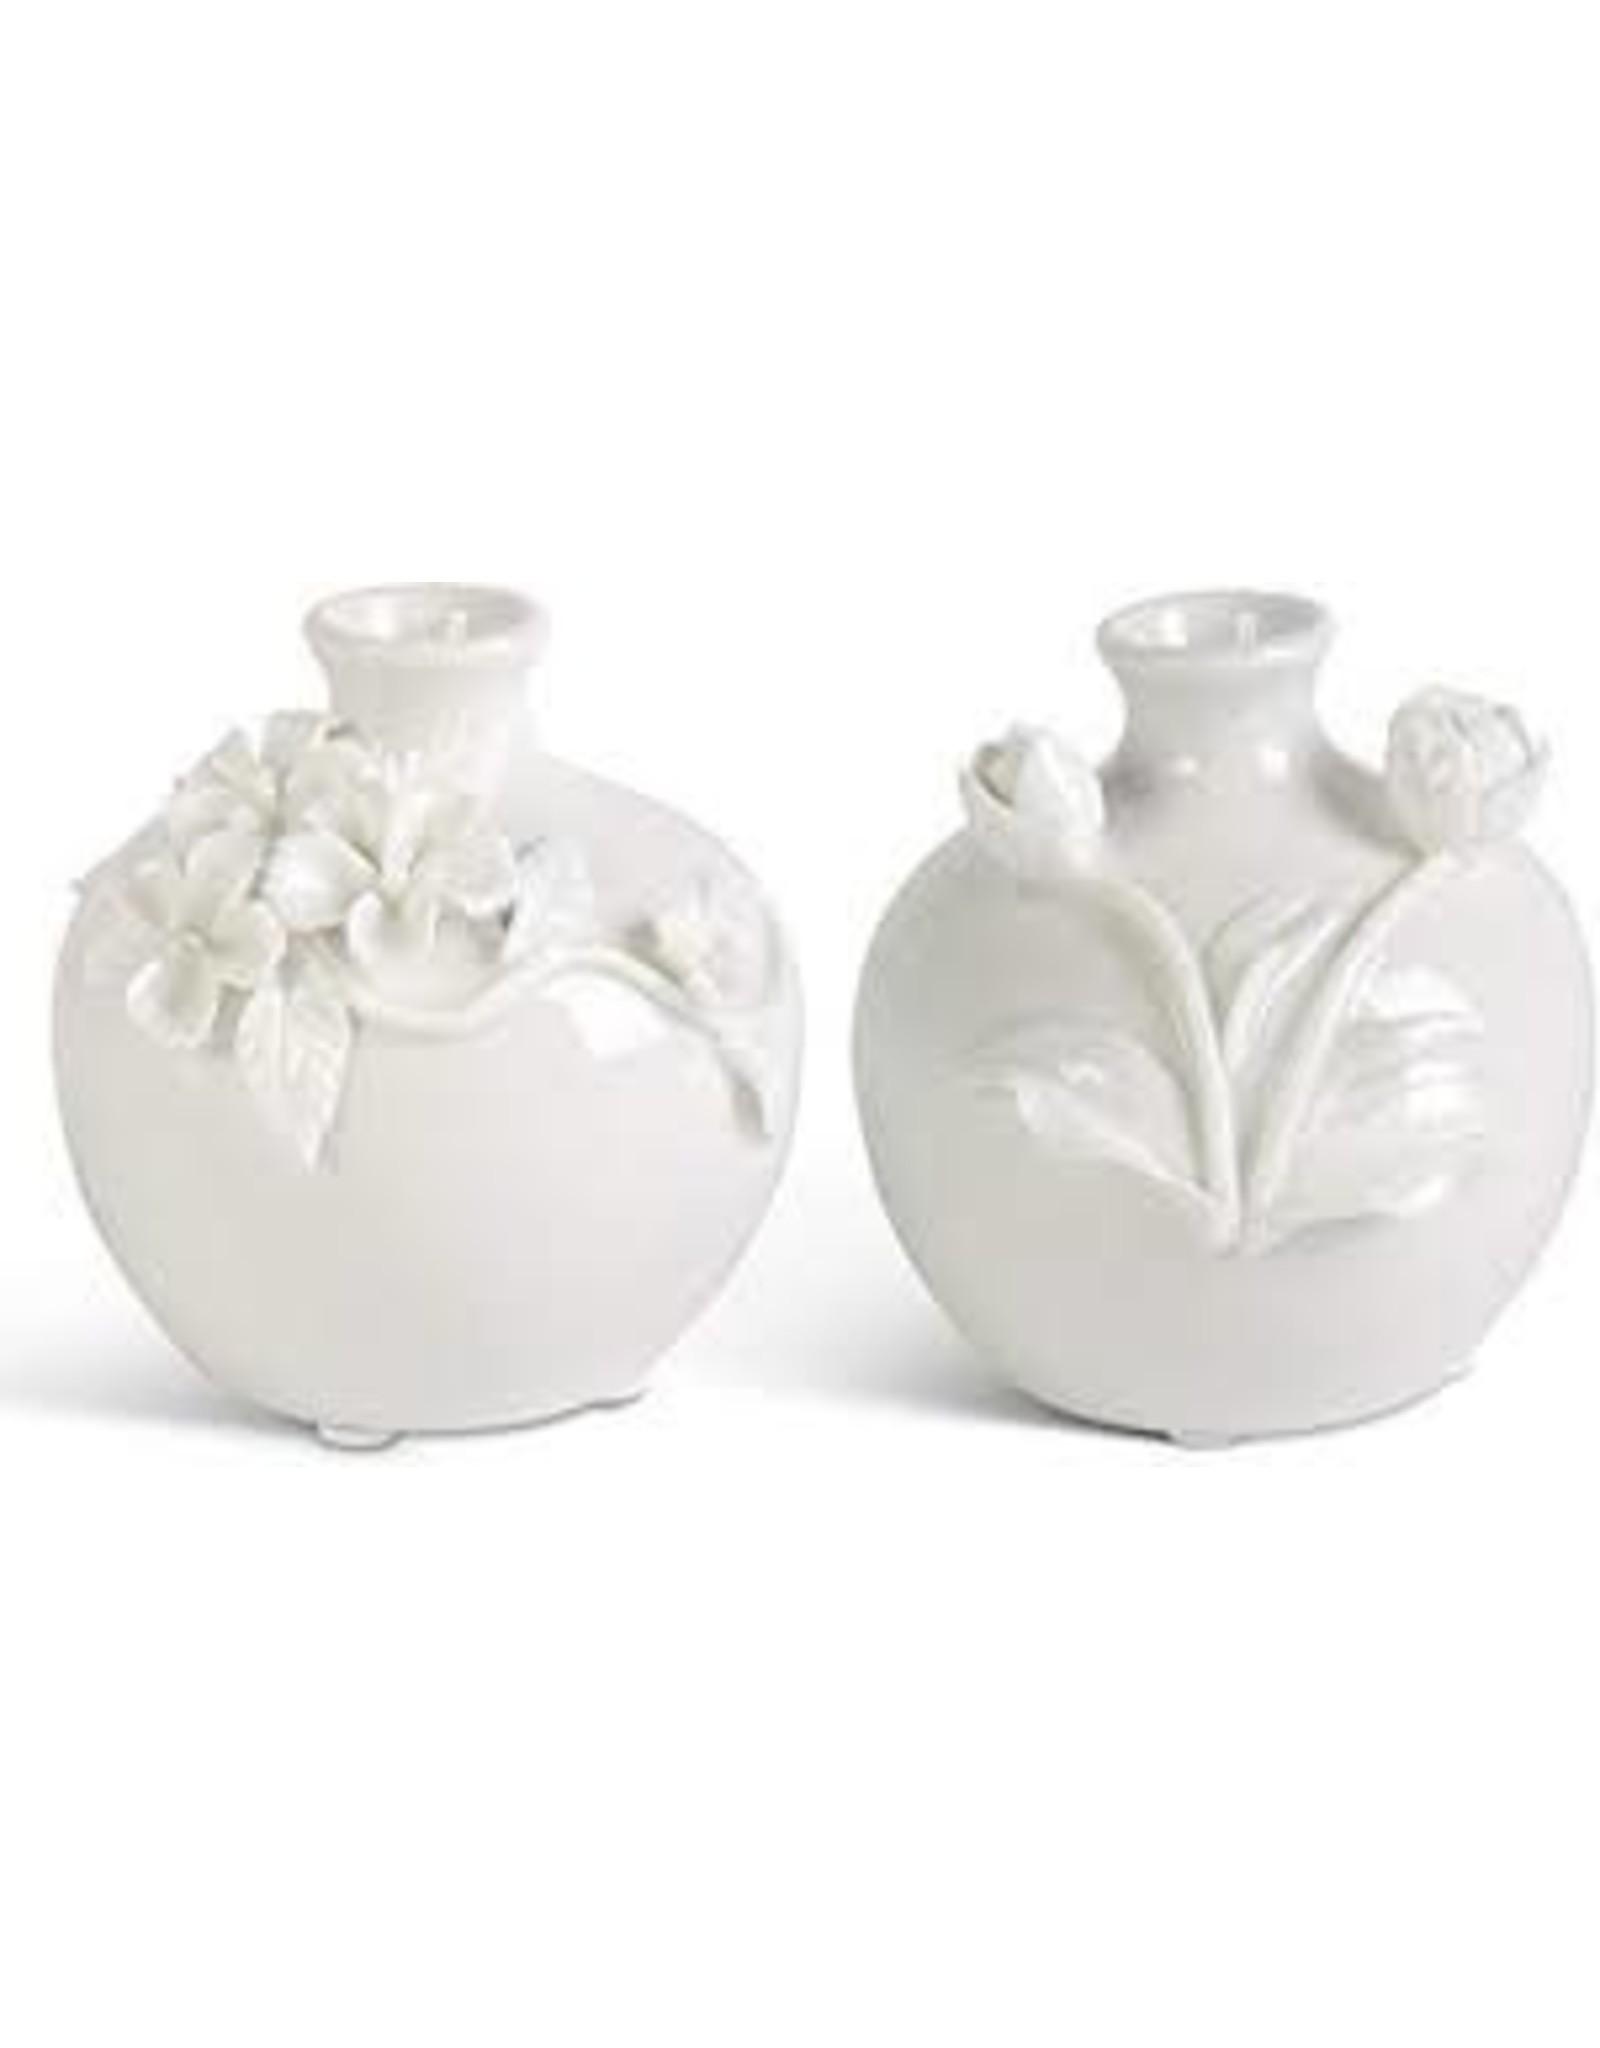 K&K Interiors Small White Vase With Raised Flowers